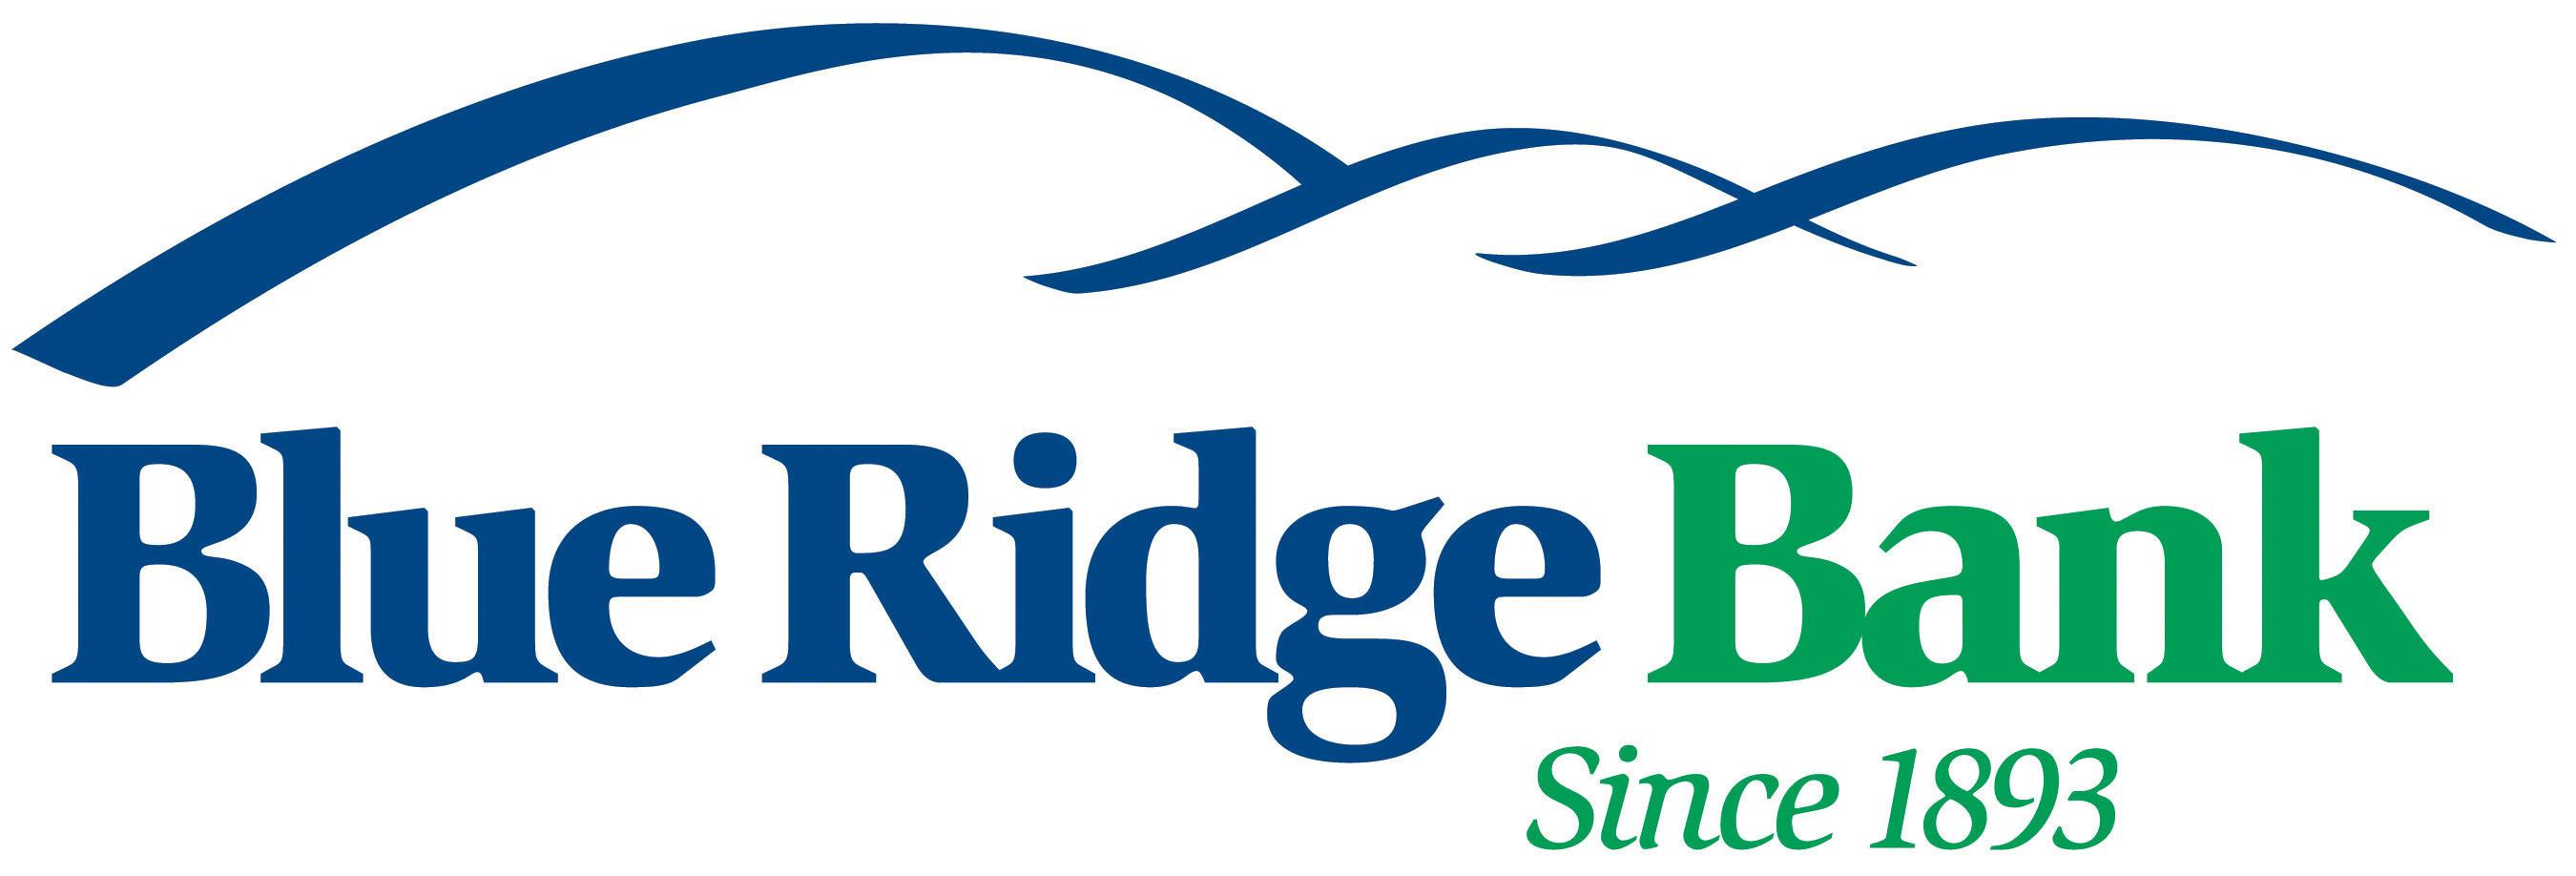 Blue Ridge Bank, since 1893.